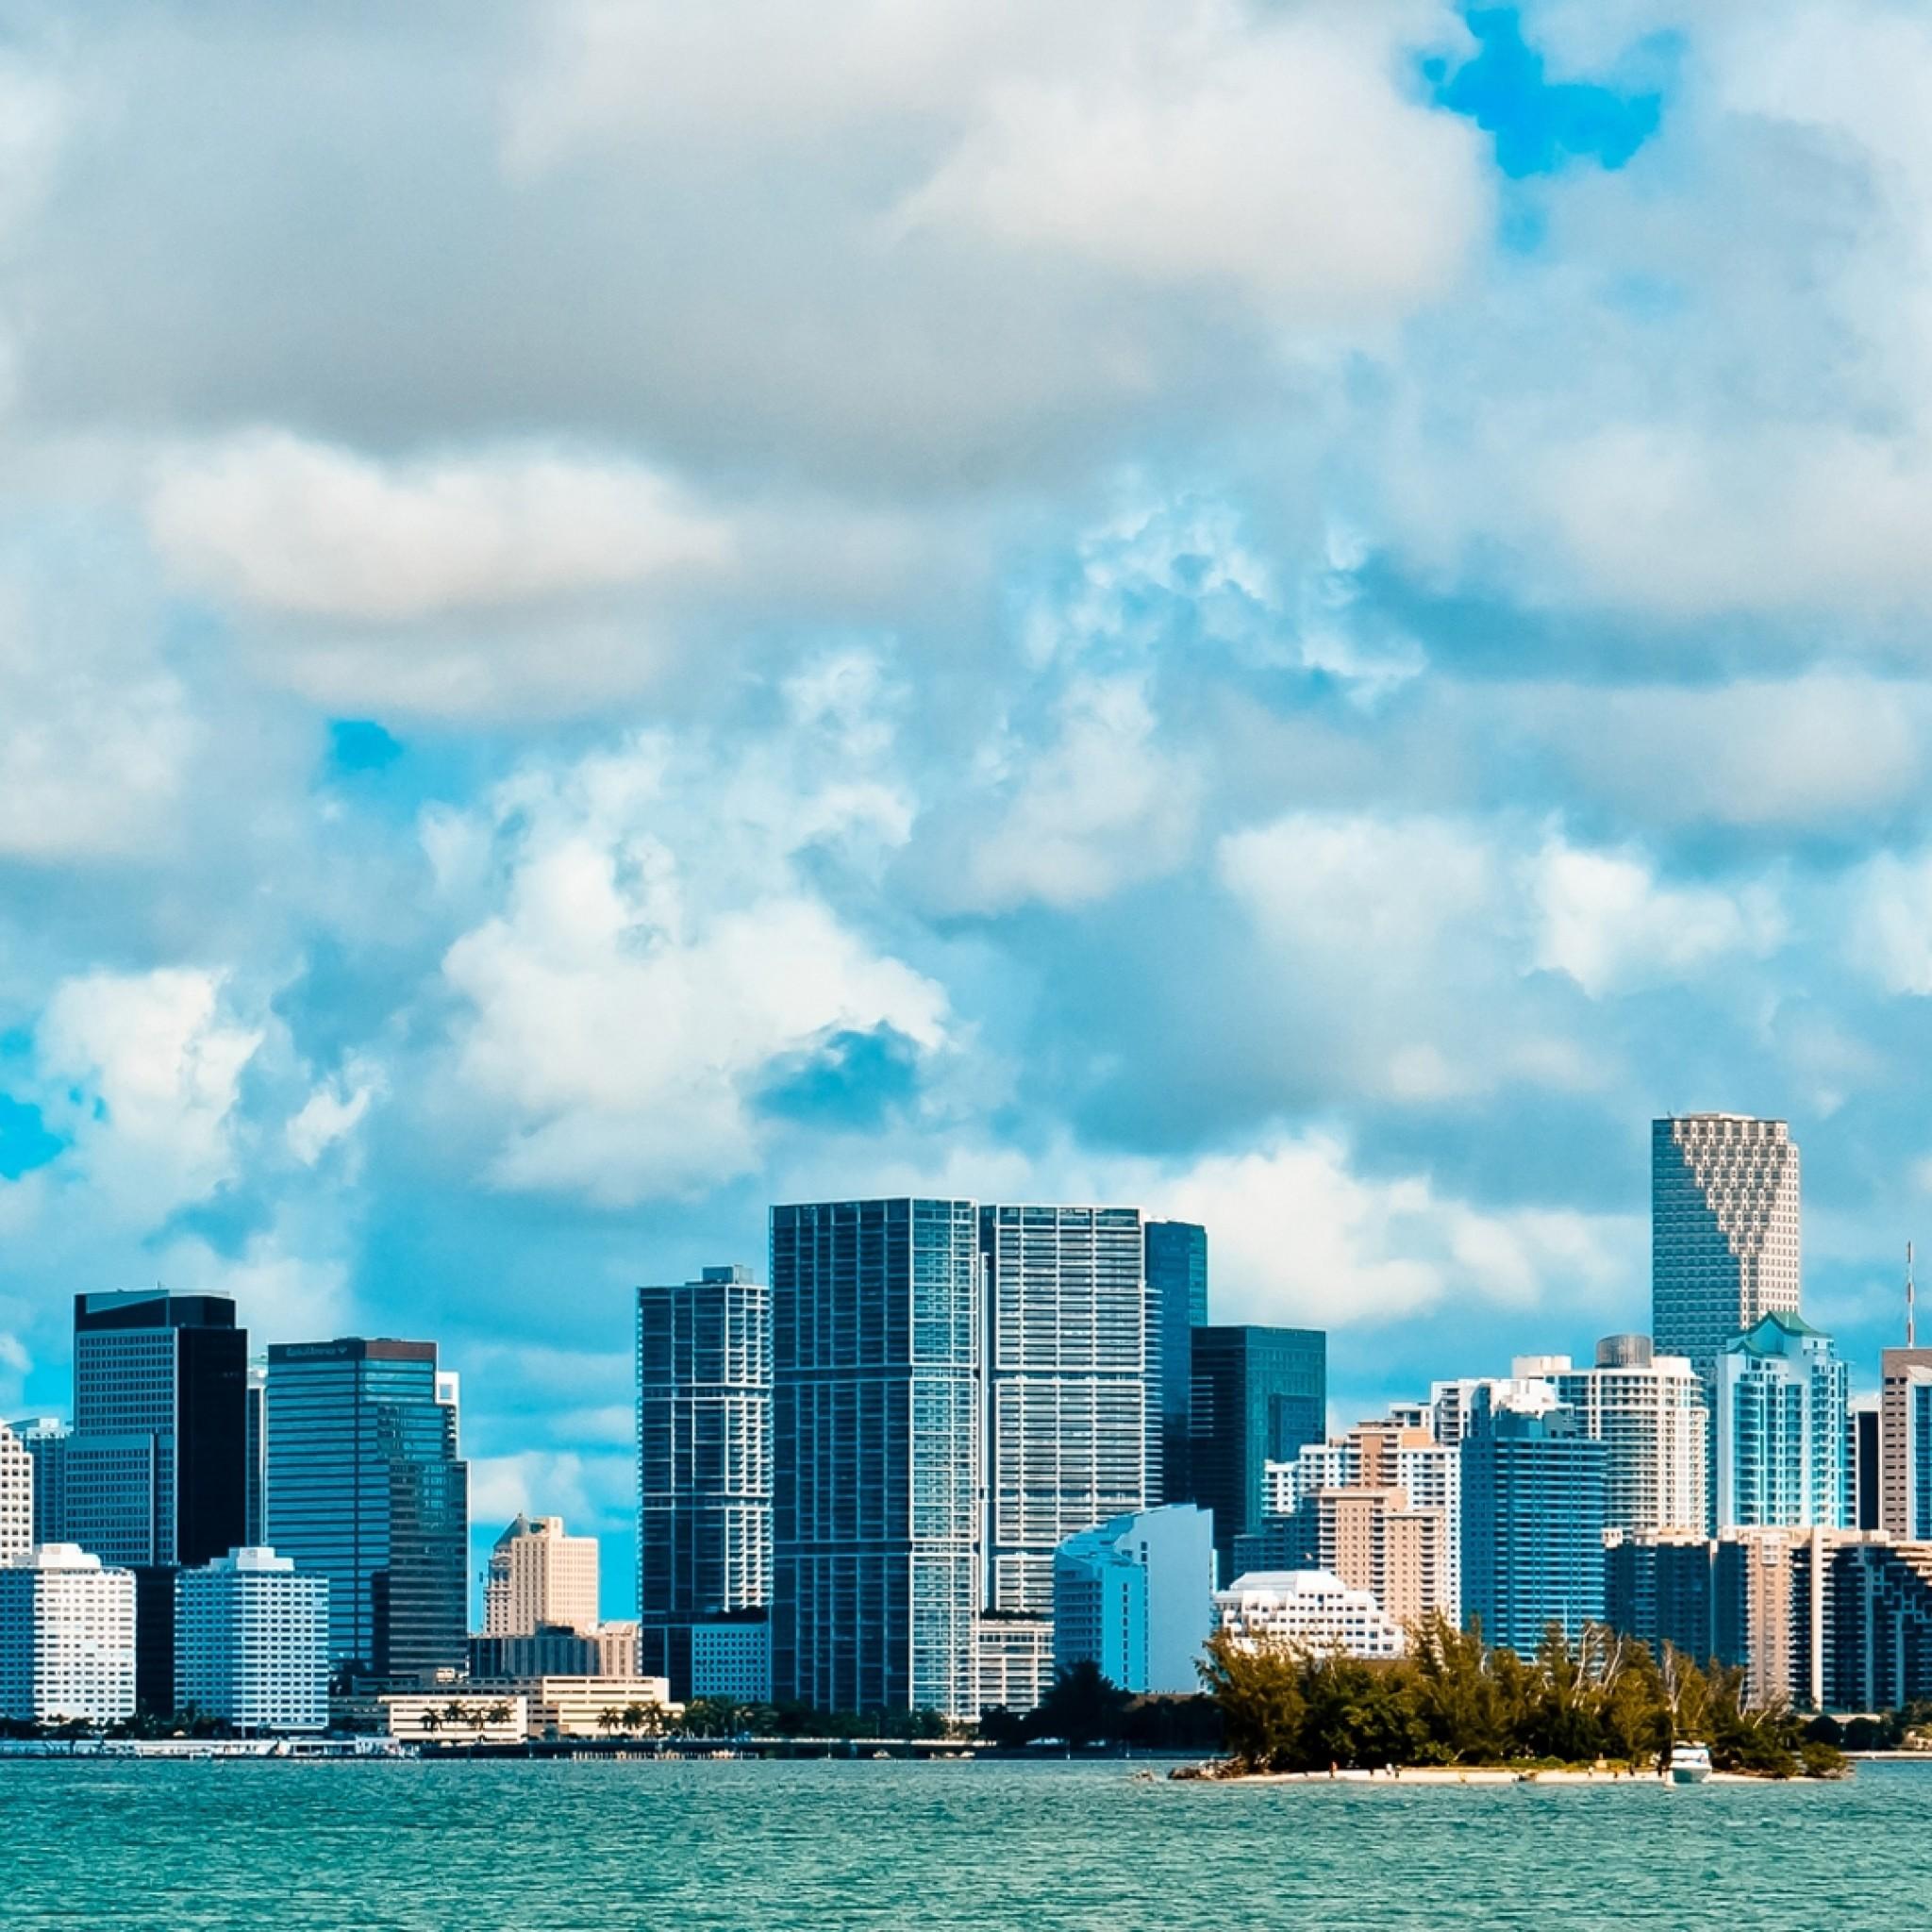 Preview wallpaper miami, usa, america, miami beach, sky, clouds, buildings